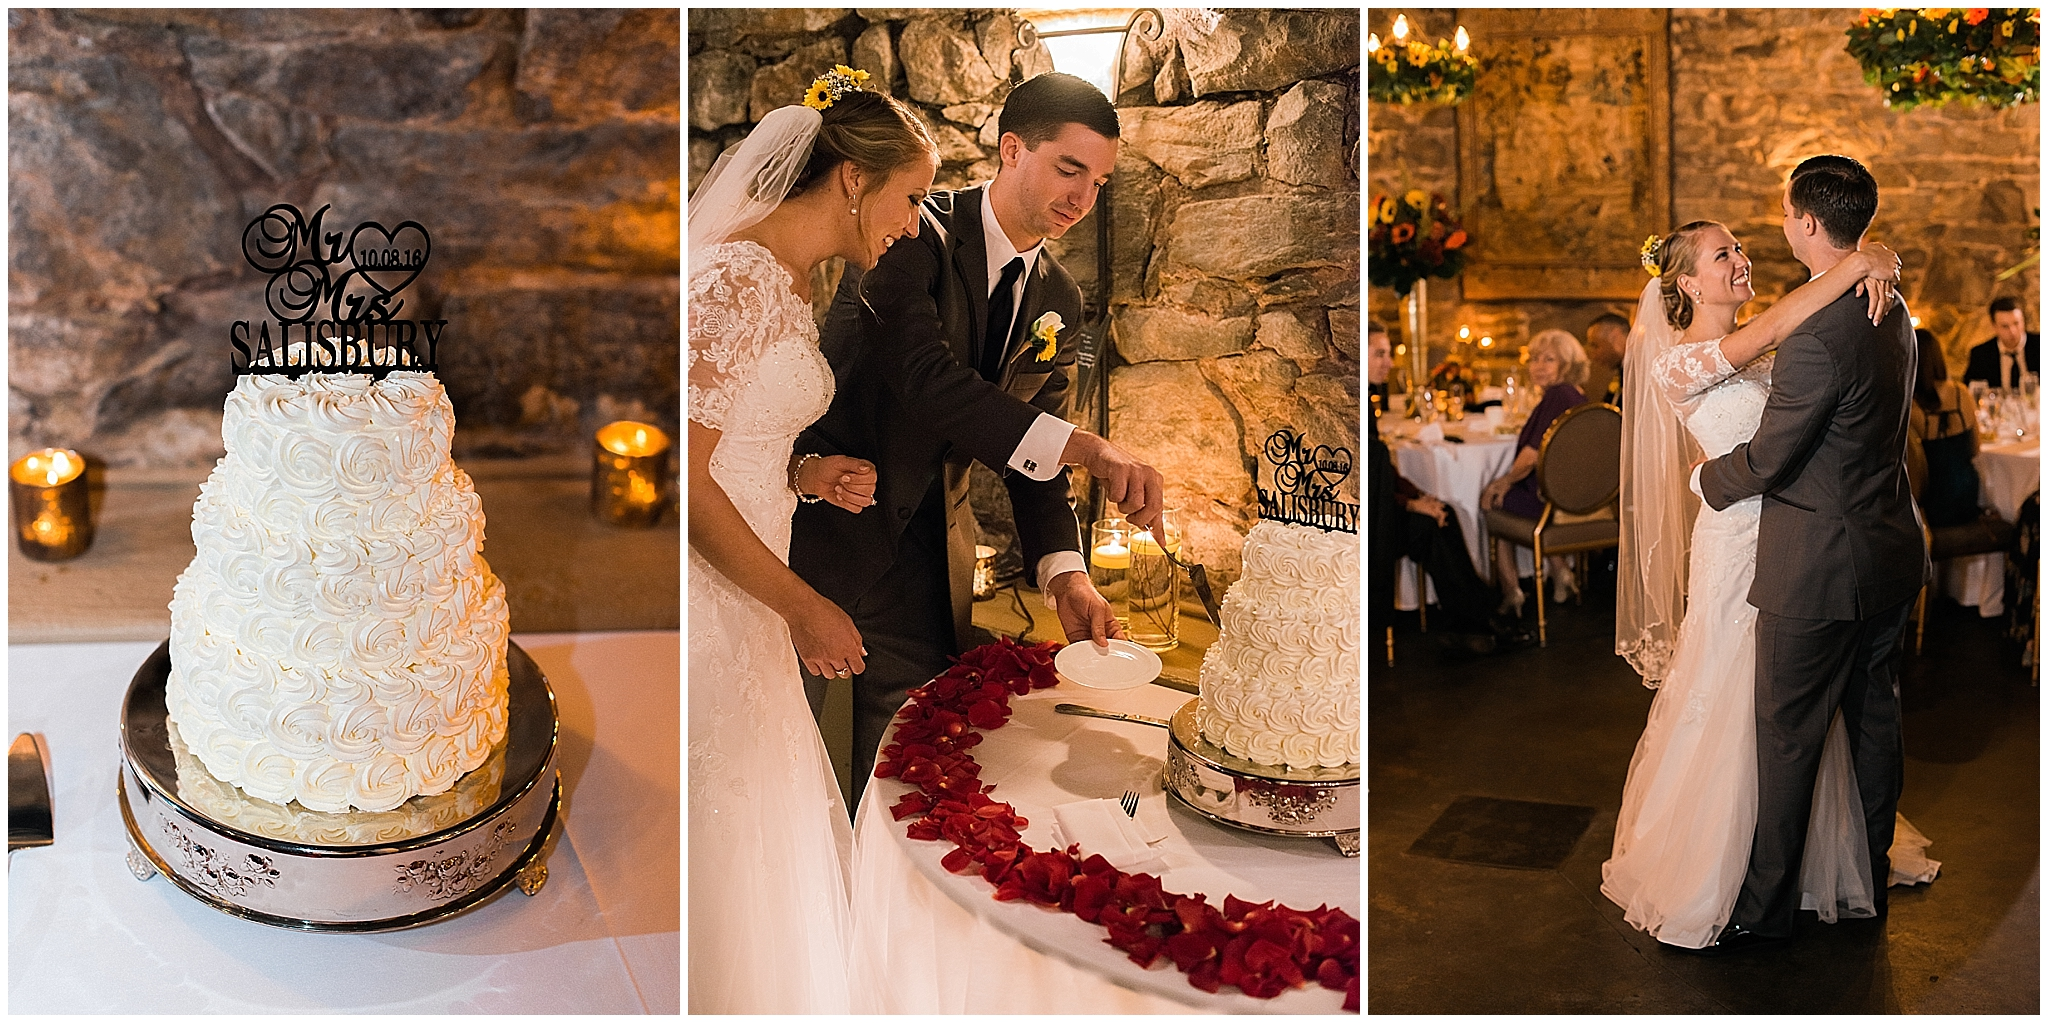 Biltmore_Wedding_Reception_Wine_Cellar_Asheville_Photographer-9.jpg